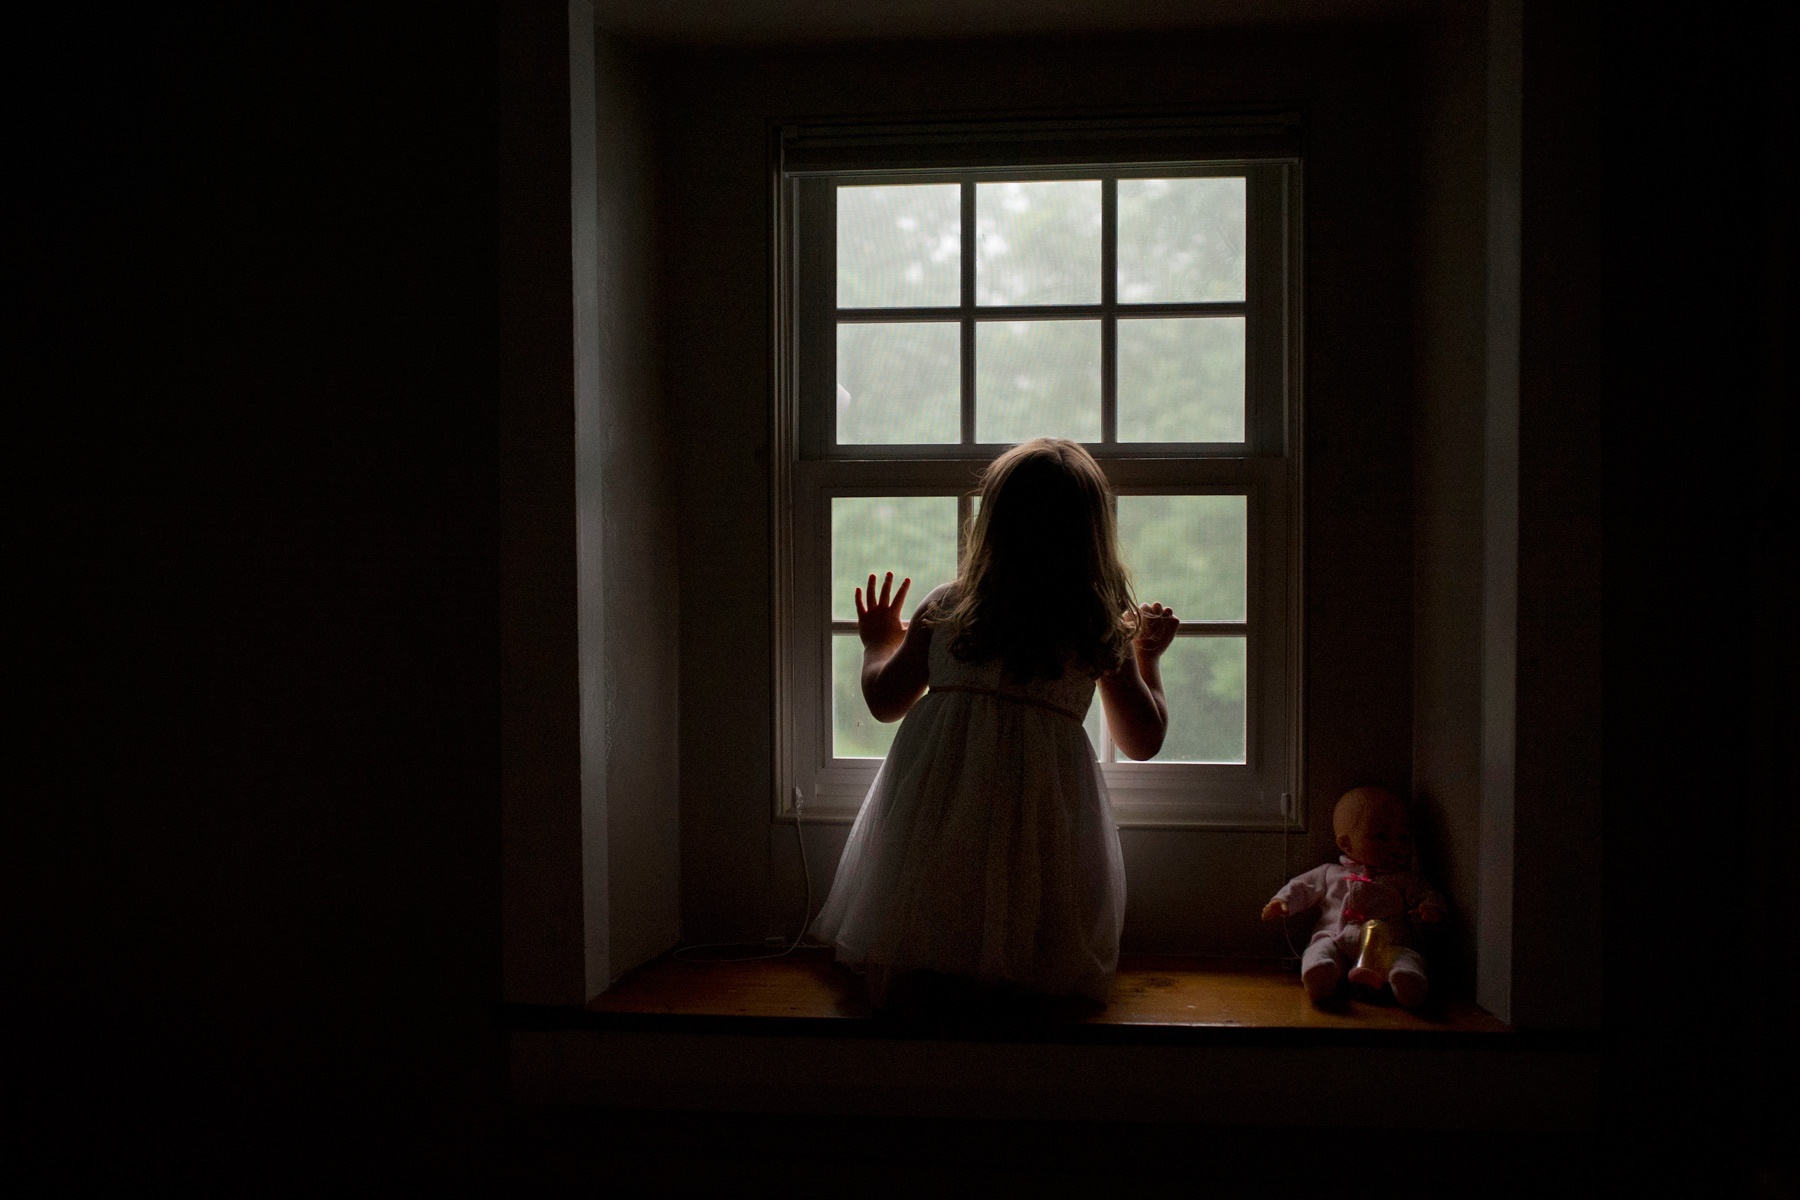 girl kneels at window observing the fog